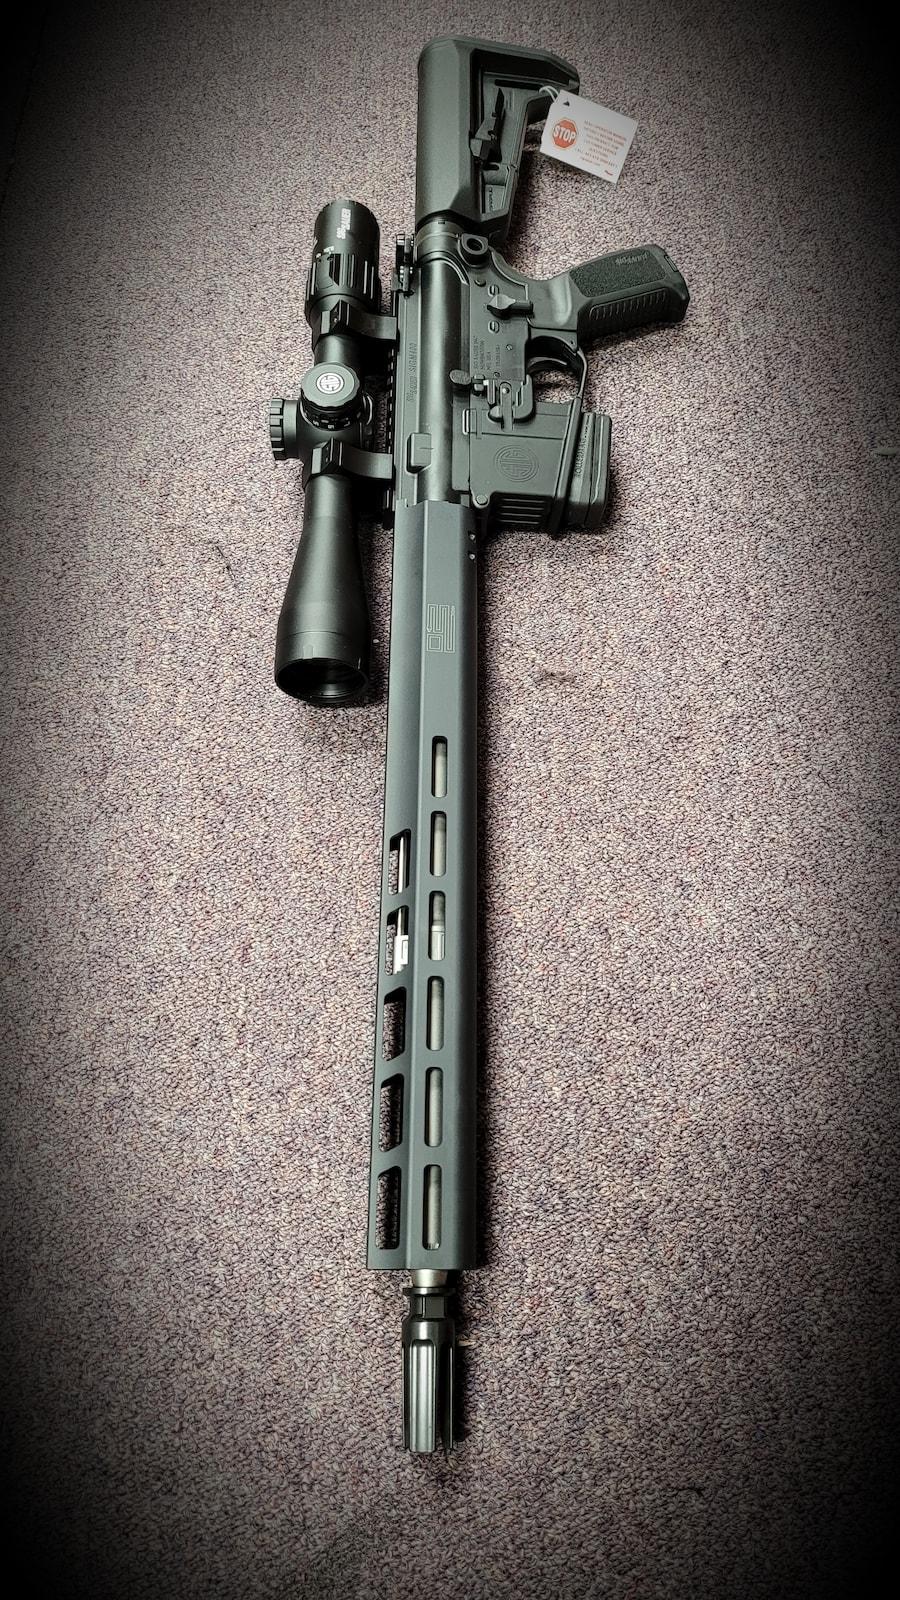 SIG SAUER Super Rare NY / CA LEGAL FIXED MAGAZINE M400 AR15 M4 SIG SAUER